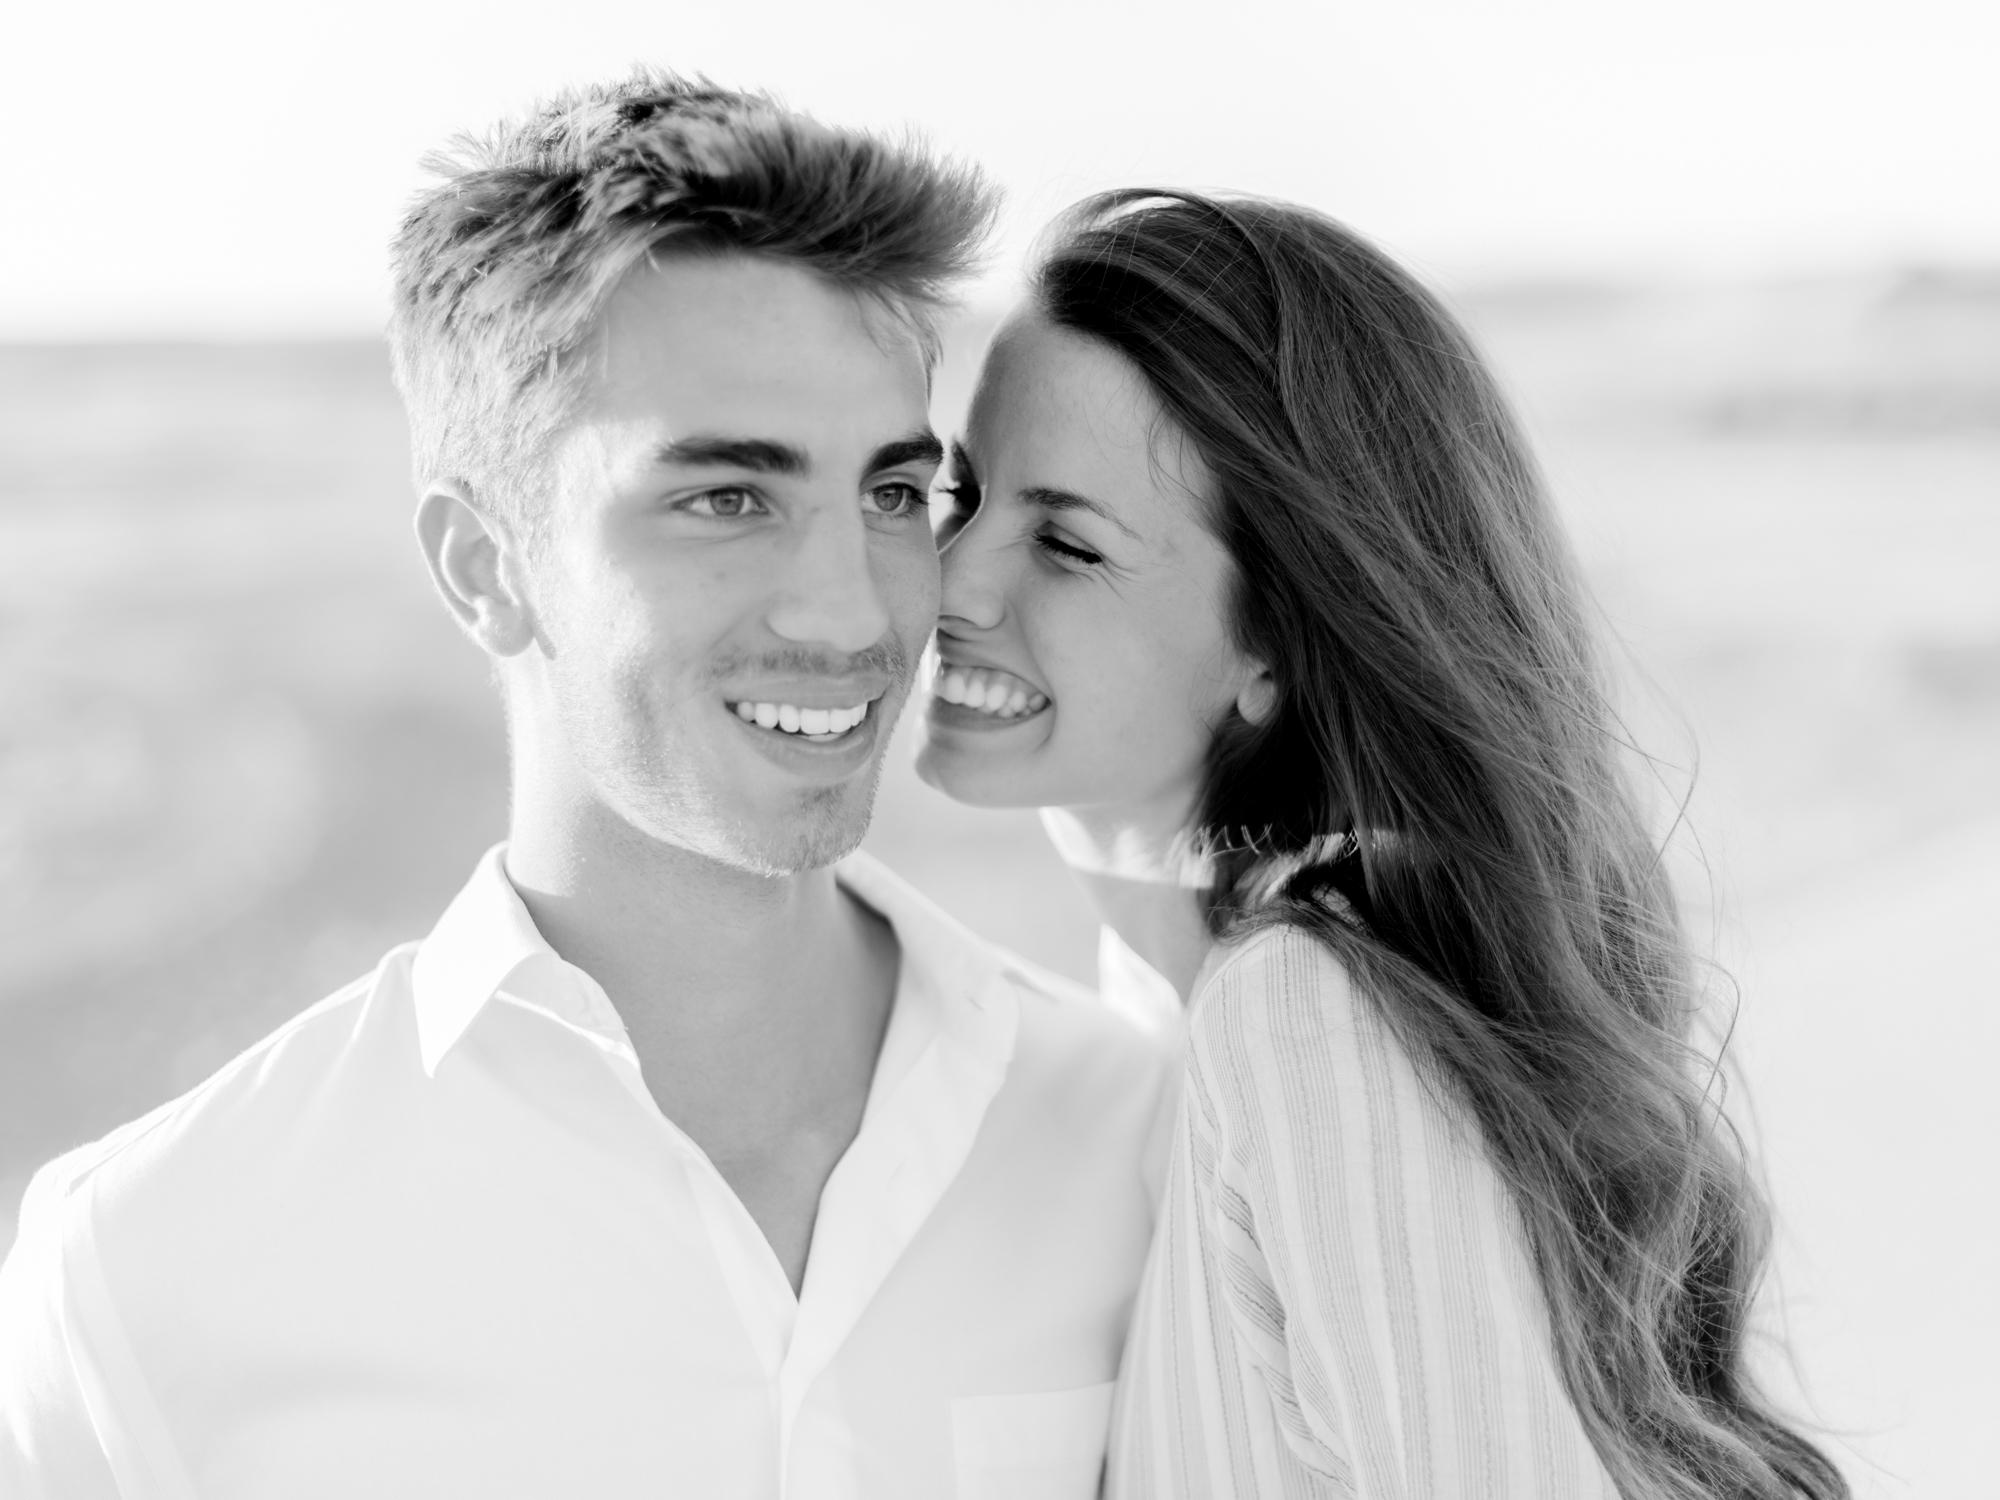 charlotte-charleston-wedding-family-film-destination-photographer-bruneau-sand-dunes-boise-idaho-25.jpg